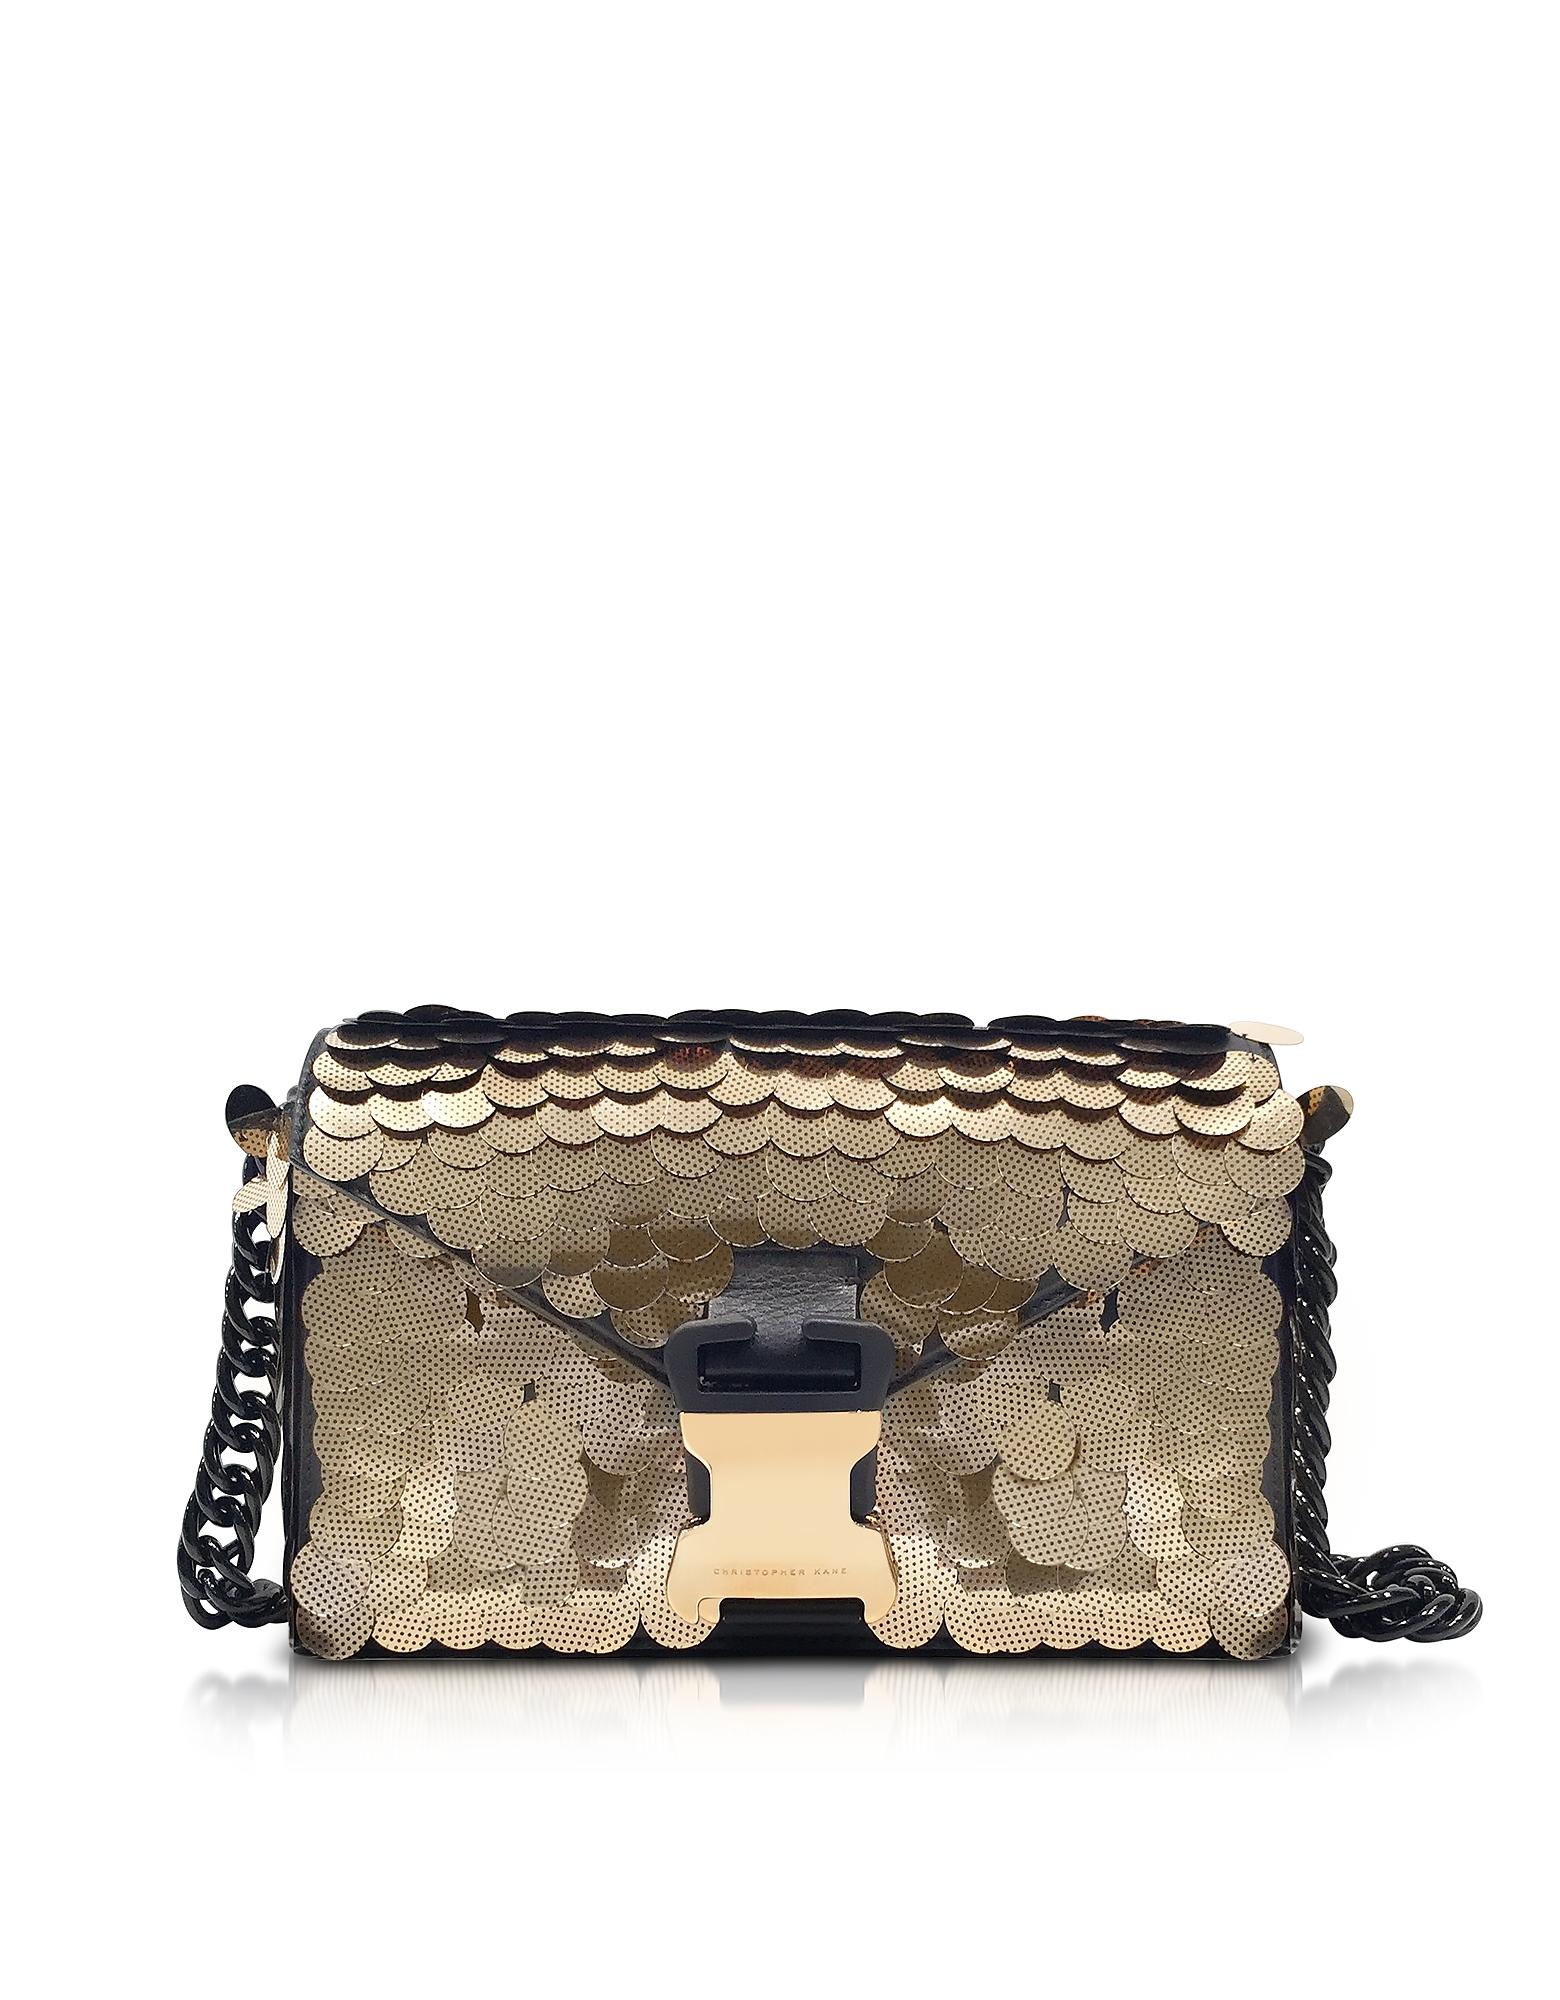 Christopher Kane Handbags, Gold Sequins Classic Devine Clutch w/Chain Strap